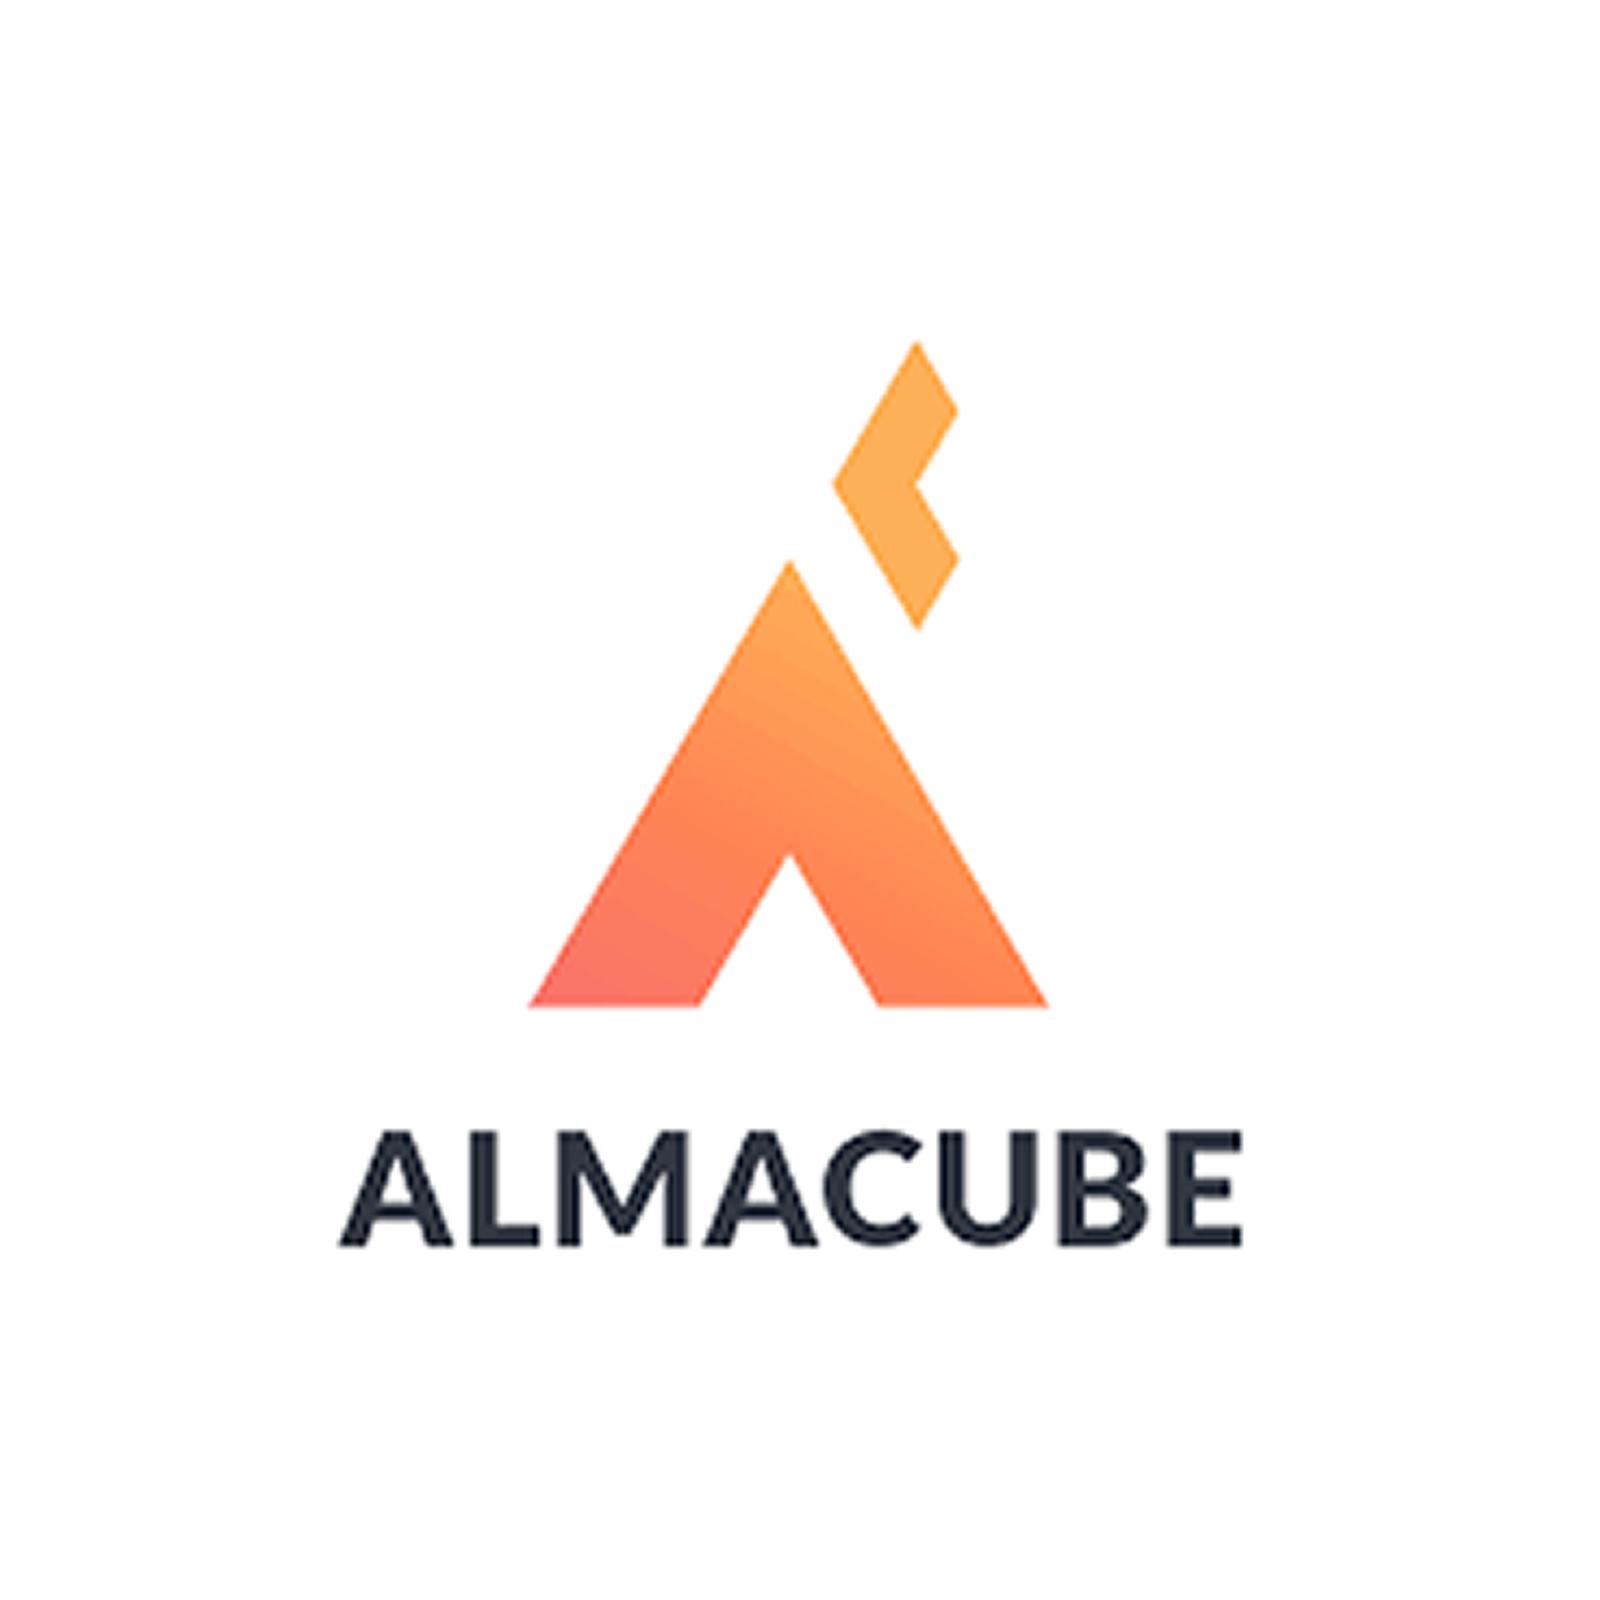 Fragile Srl - Almacube